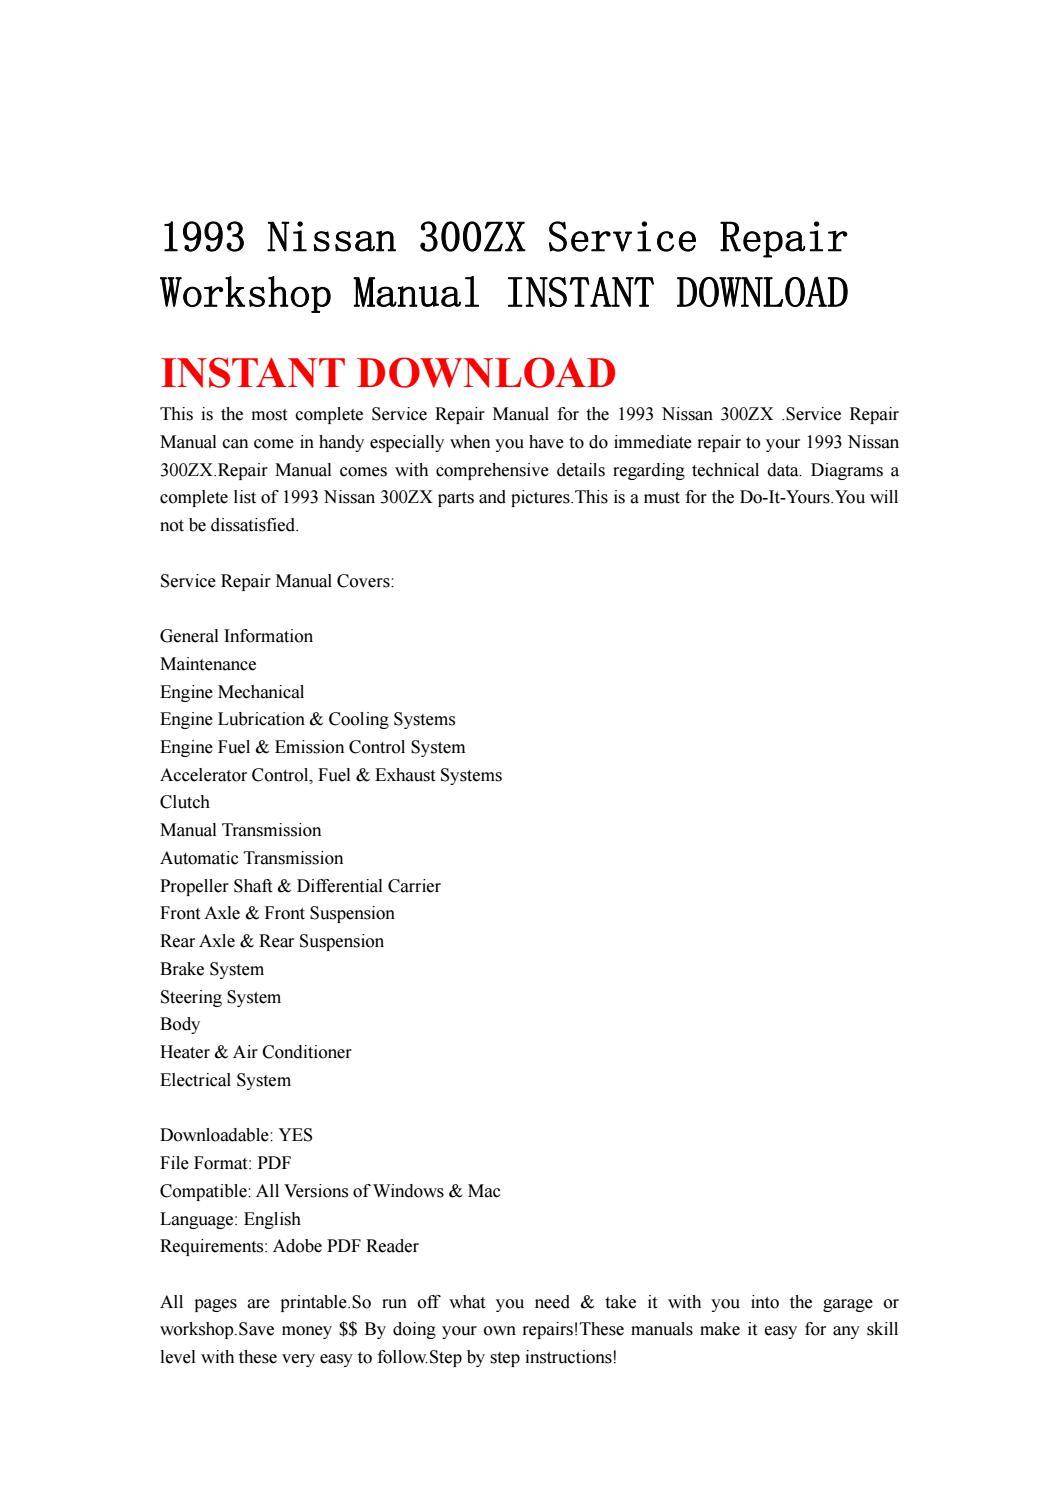 1993 nissan 300zx service repair workshop manual instant download